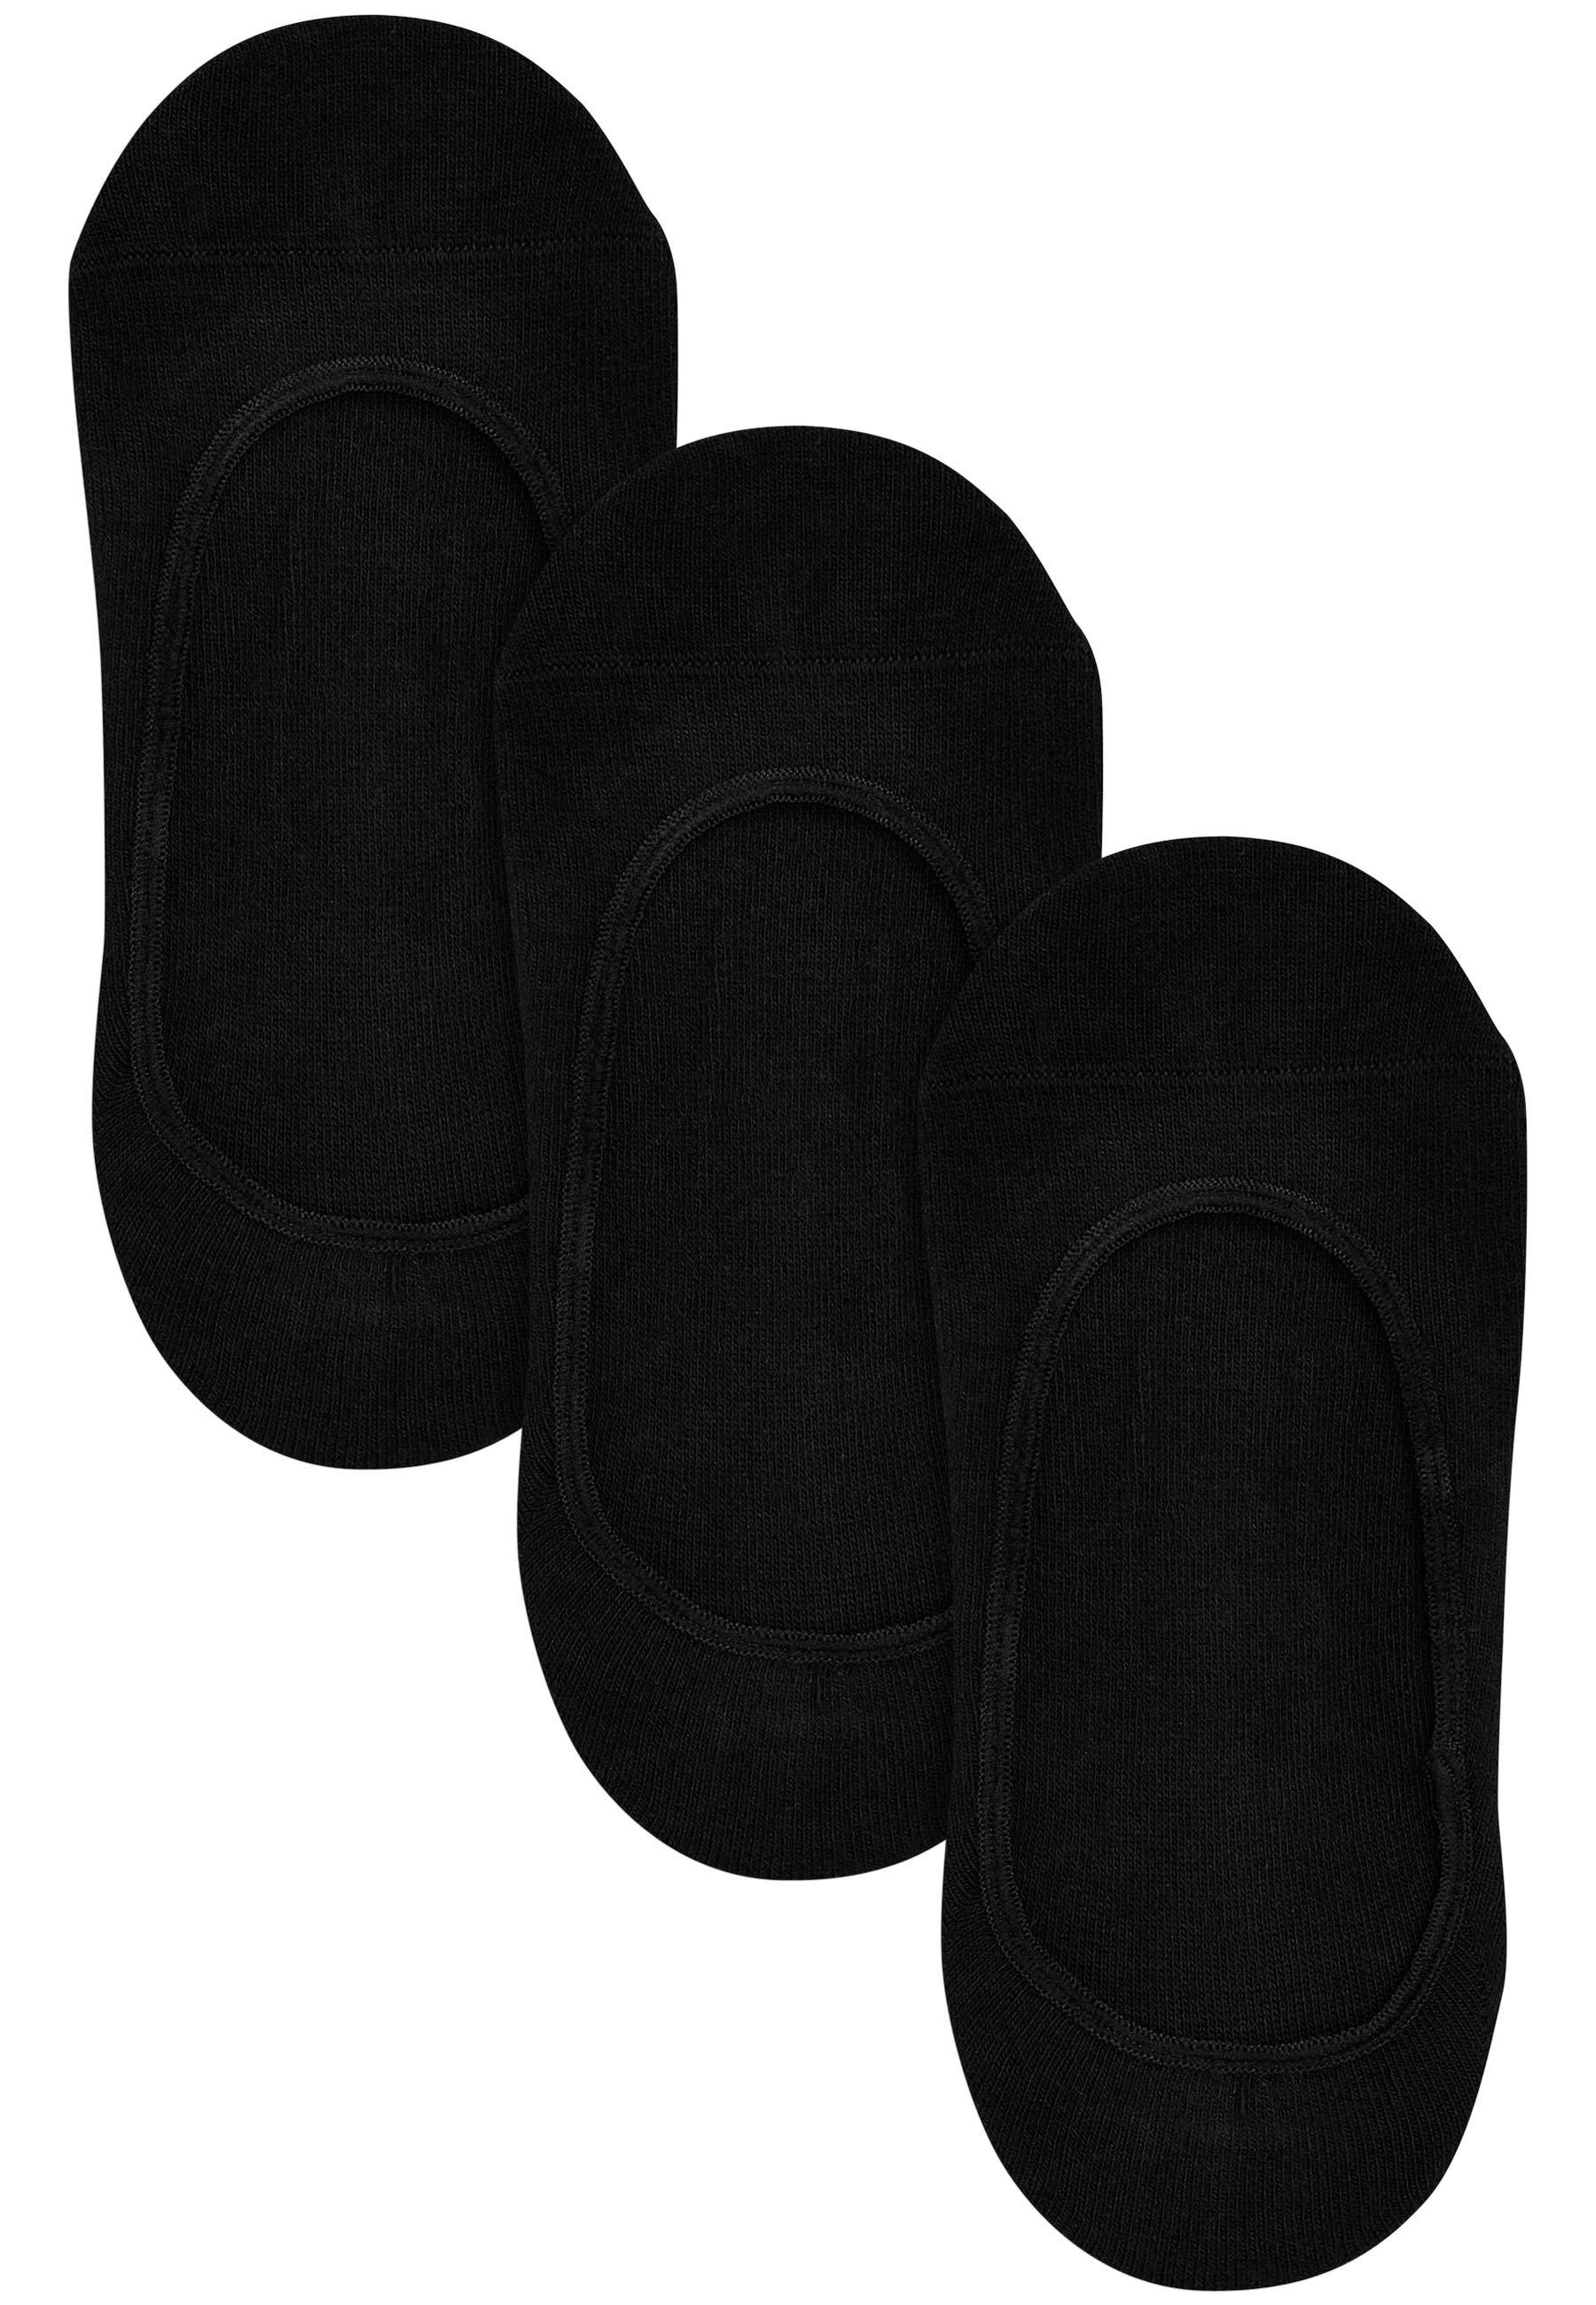 Femme 3 PACK - Socquettes